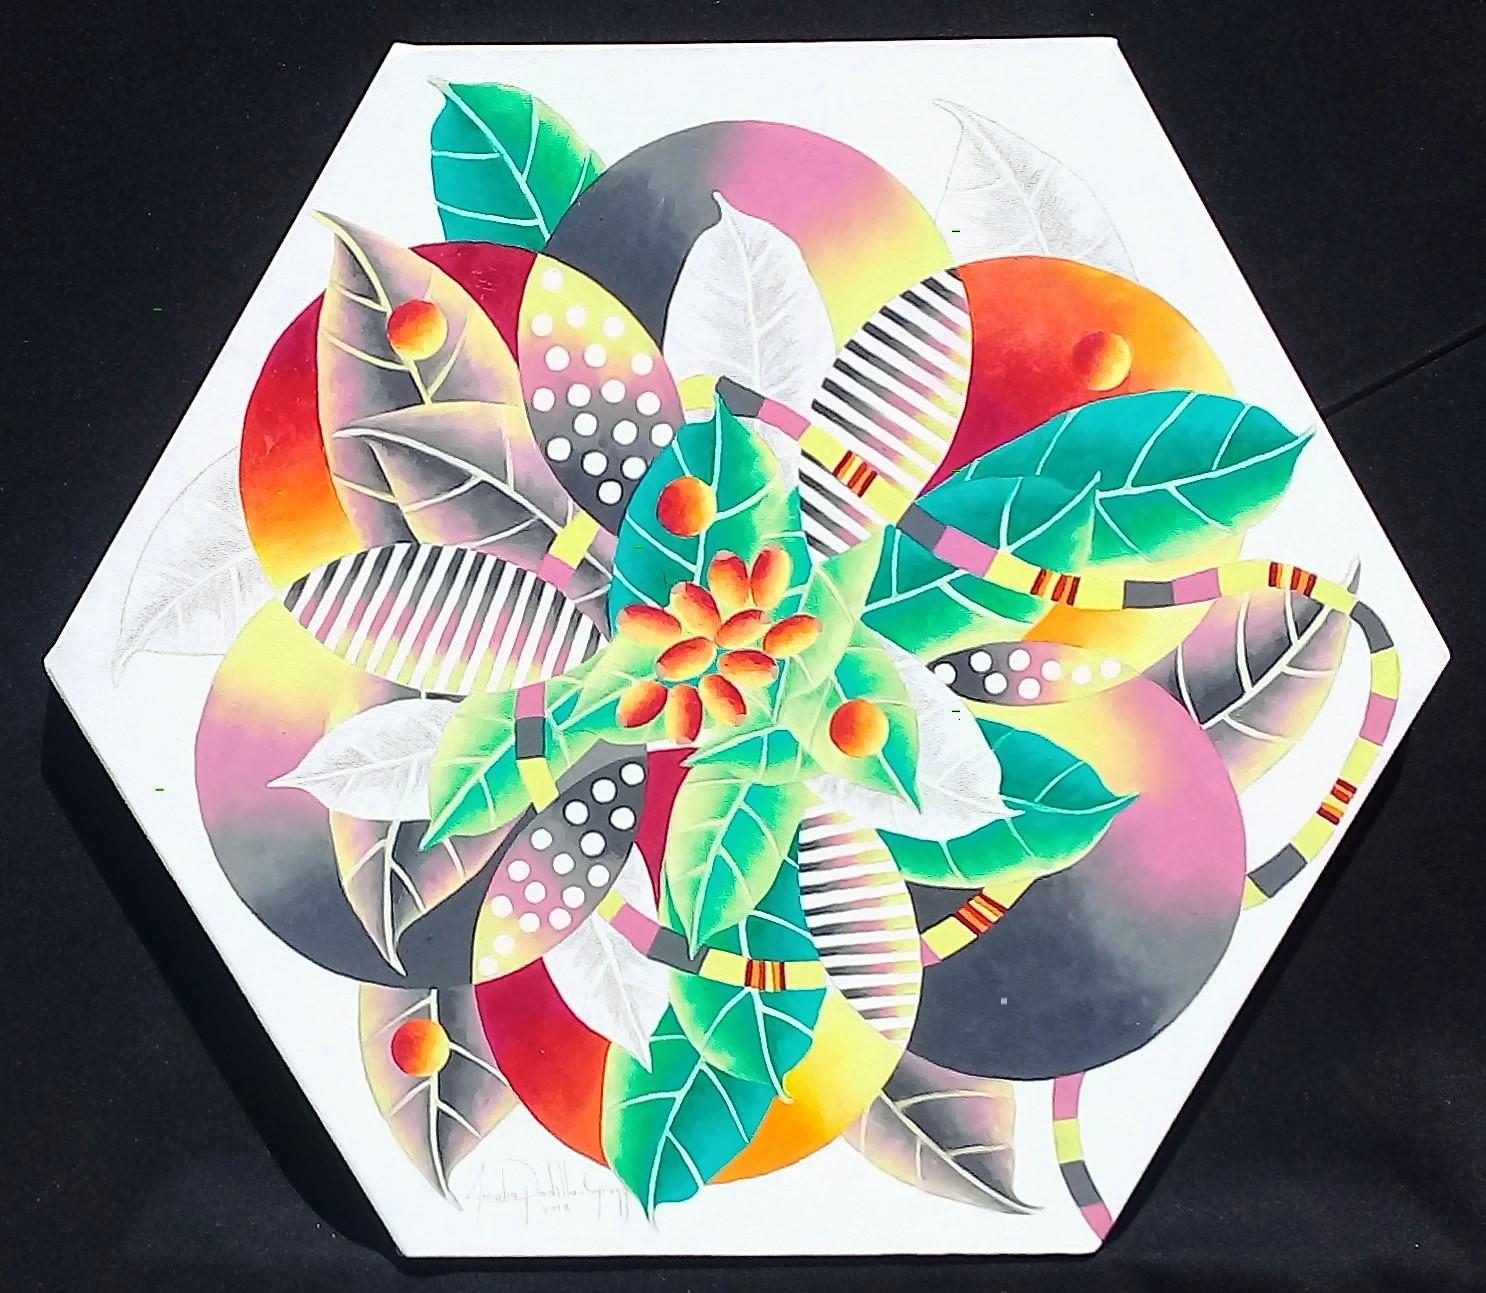 Reborn, 53cm x 61 cm, oil and pencil on canvas